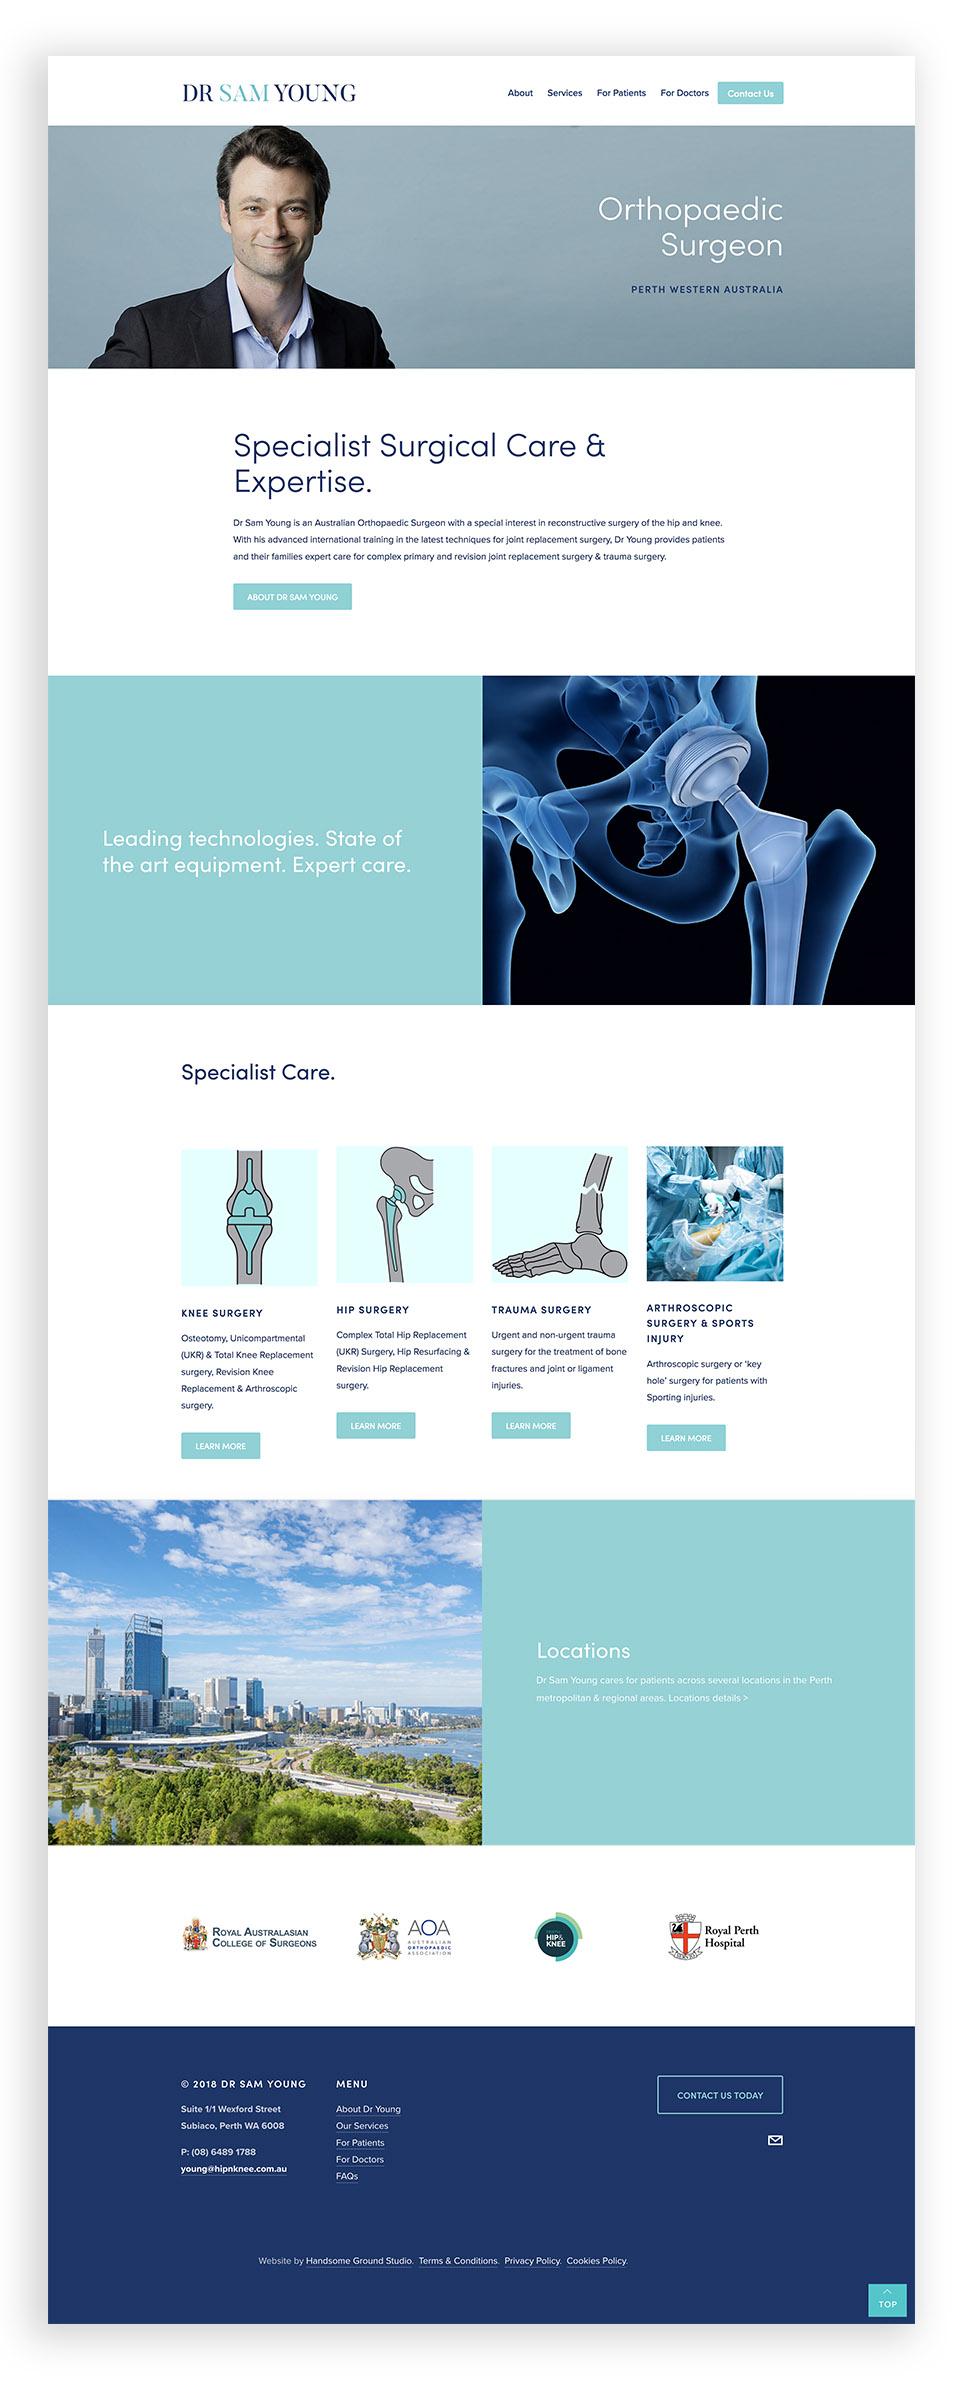 Website Design & Branding for Orthopaedic Surgeon